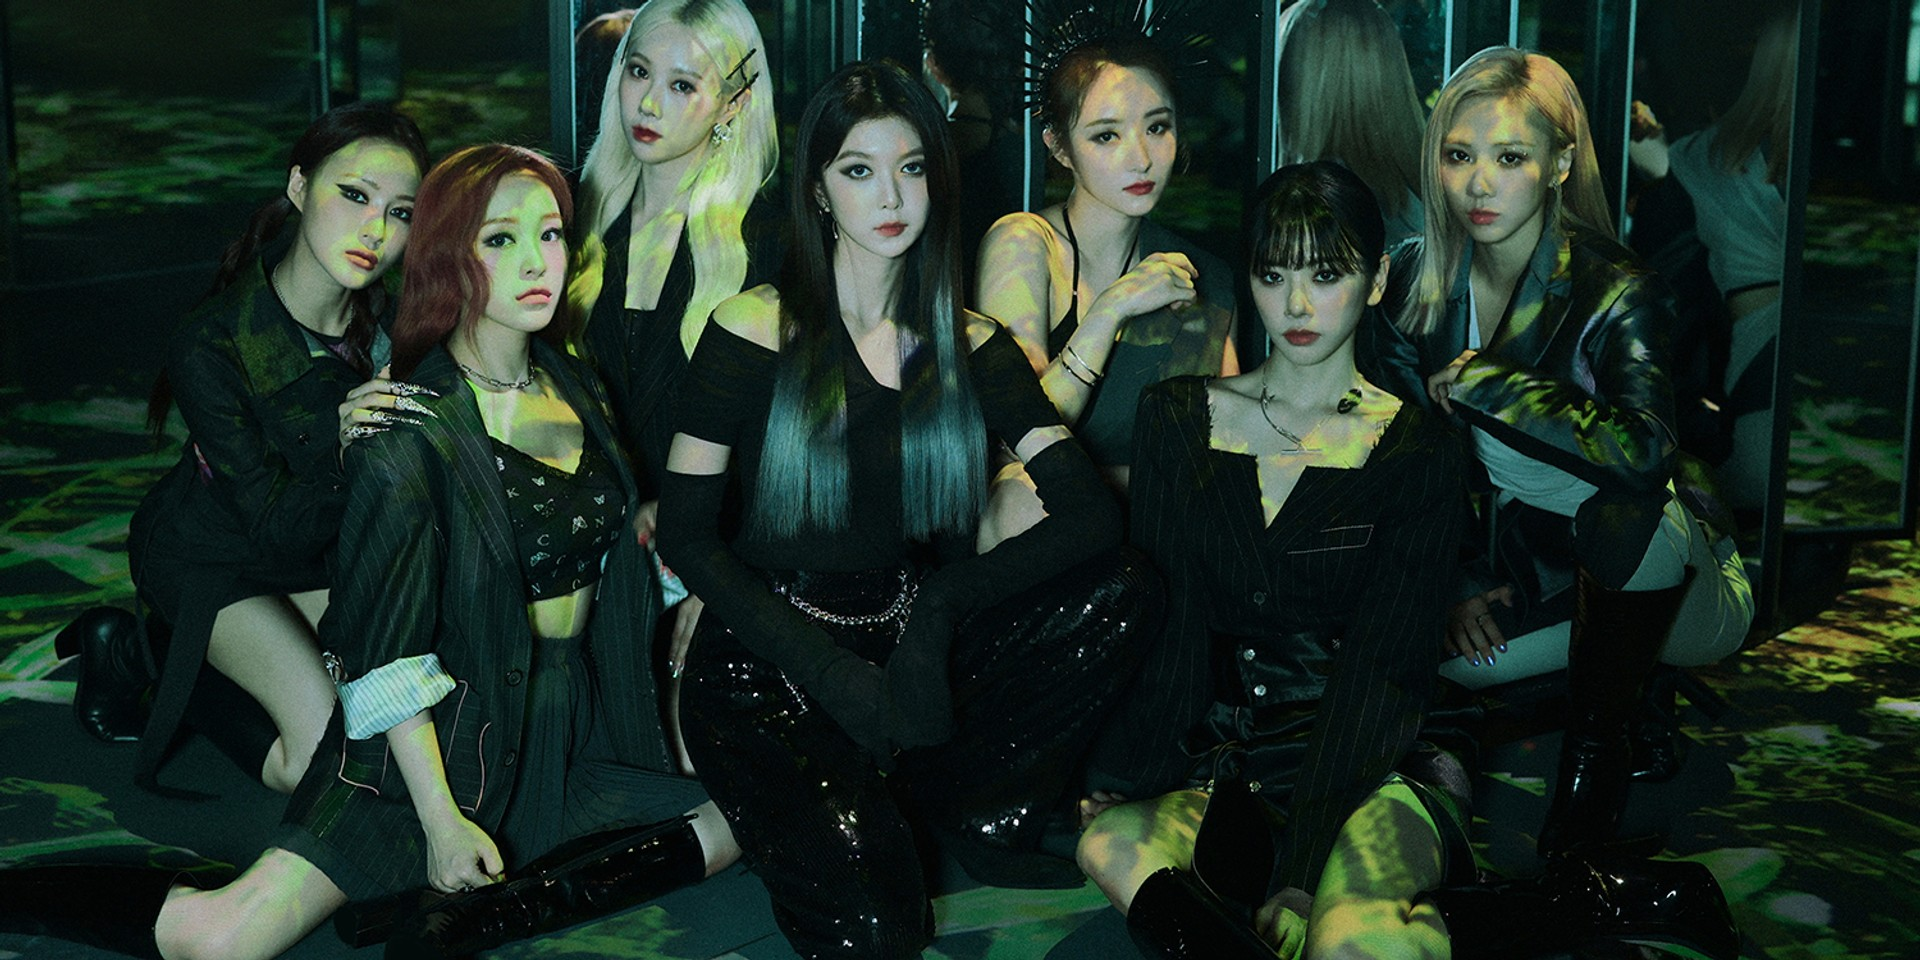 Dreamcatcher welcome a gothic 'Summer Holiday' in new mini-album — listen